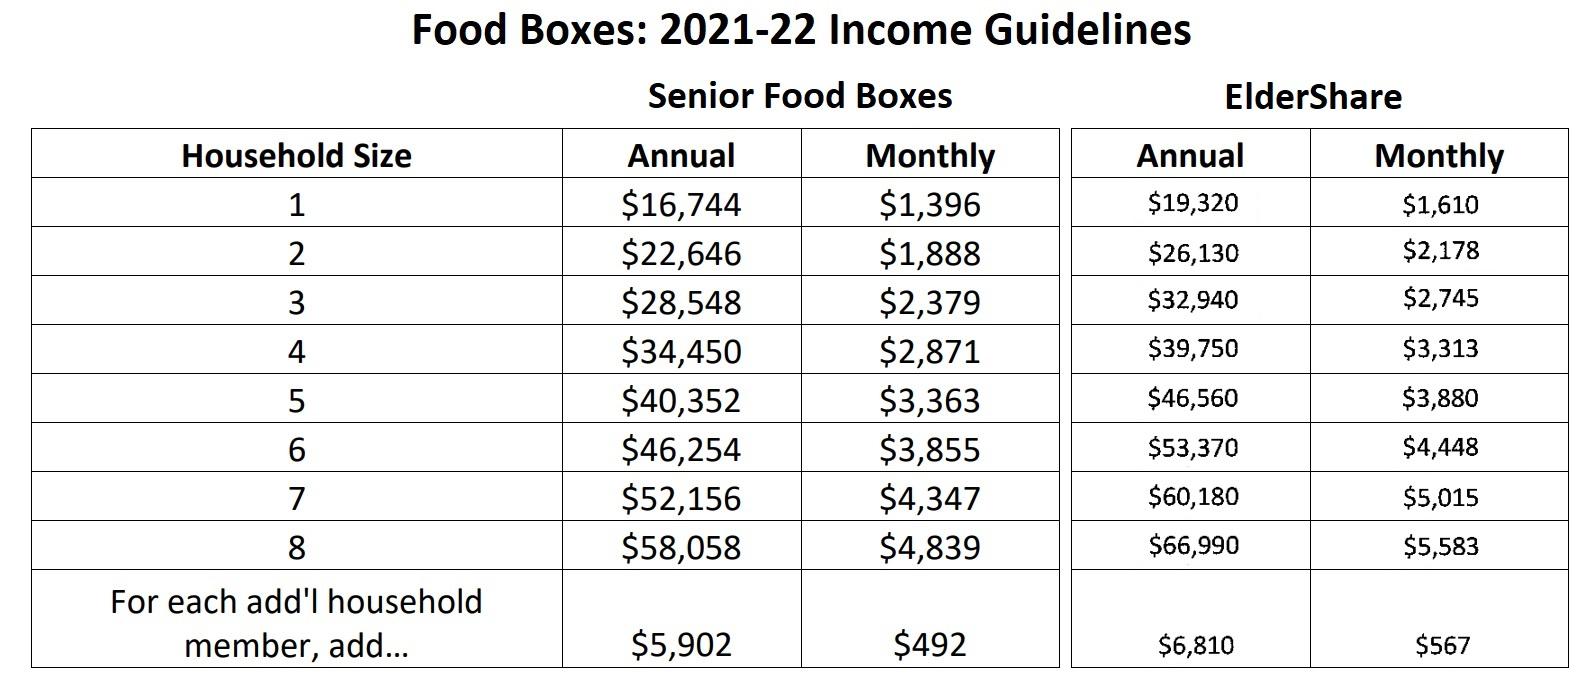 (Source: U.S. Dept. of Agriculture, Central PA Food Bank)